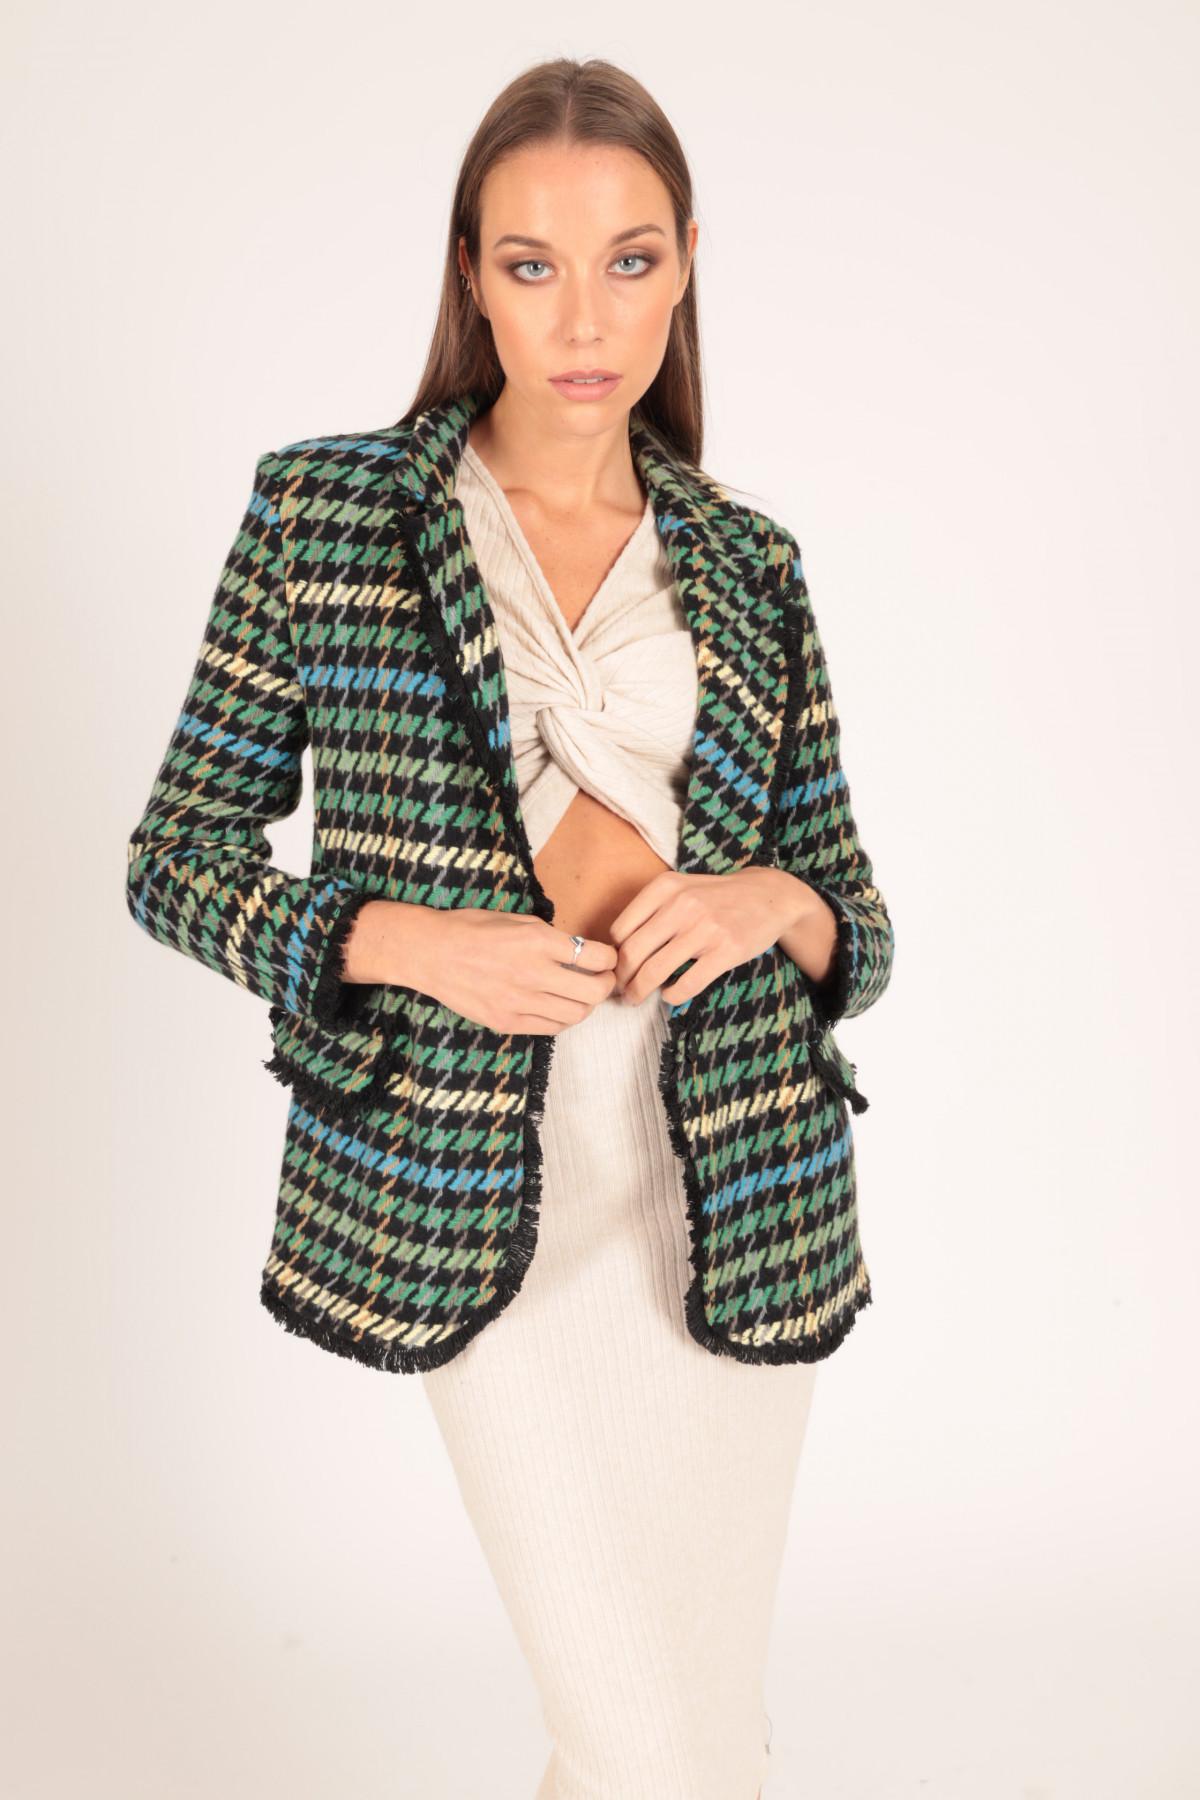 Fringed Tweed Jacket in Multicolor Pied de Poule